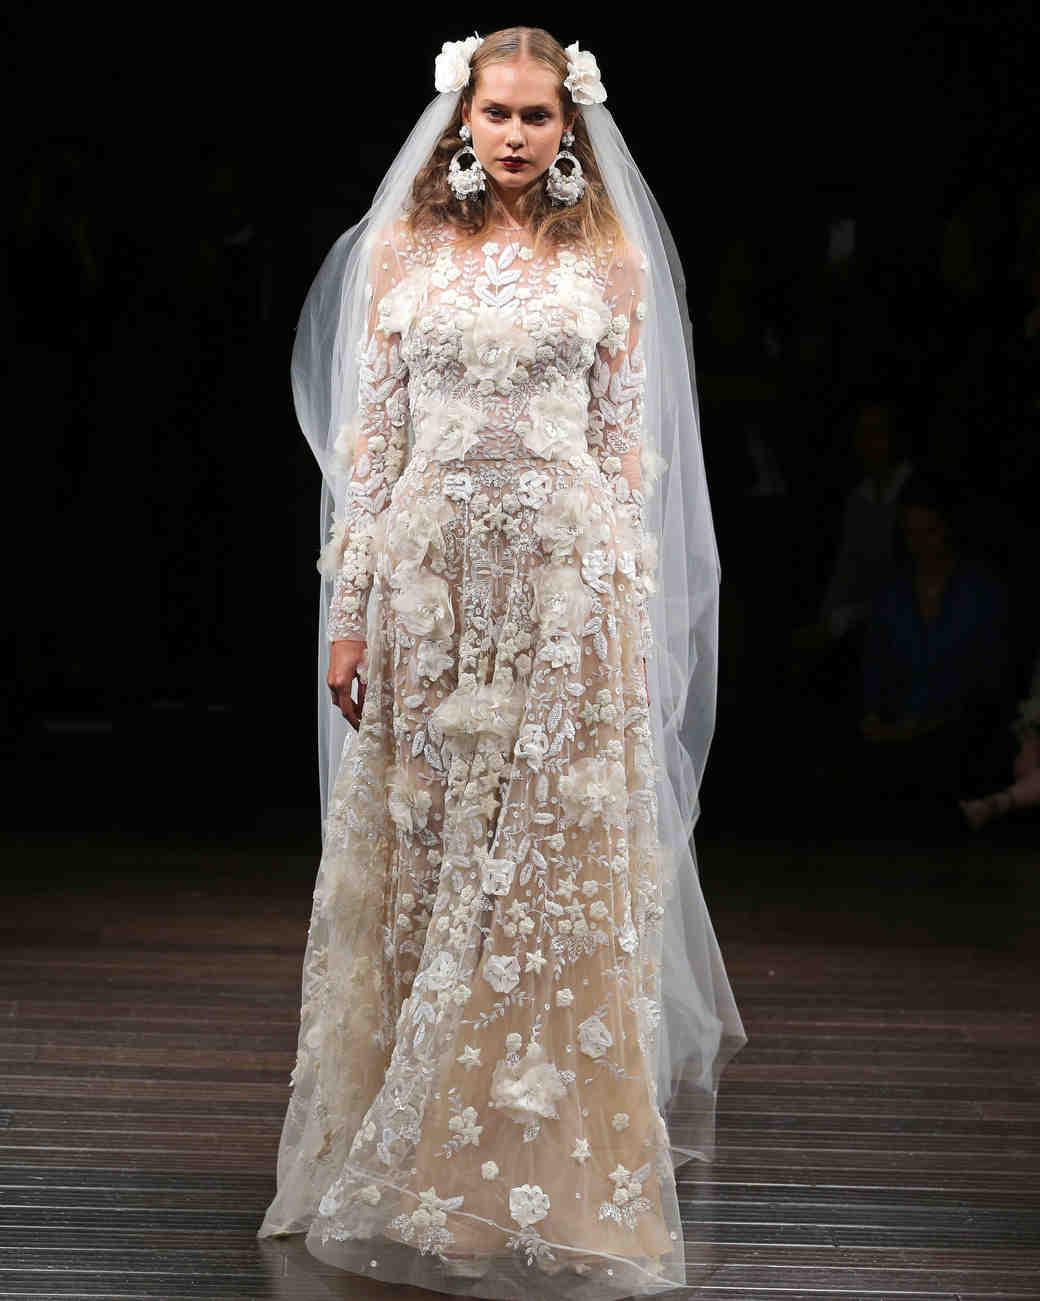 Martha stewart weddings dress finder boulcom dress style 2018 martha stewart weddings dress finder junglespirit Gallery